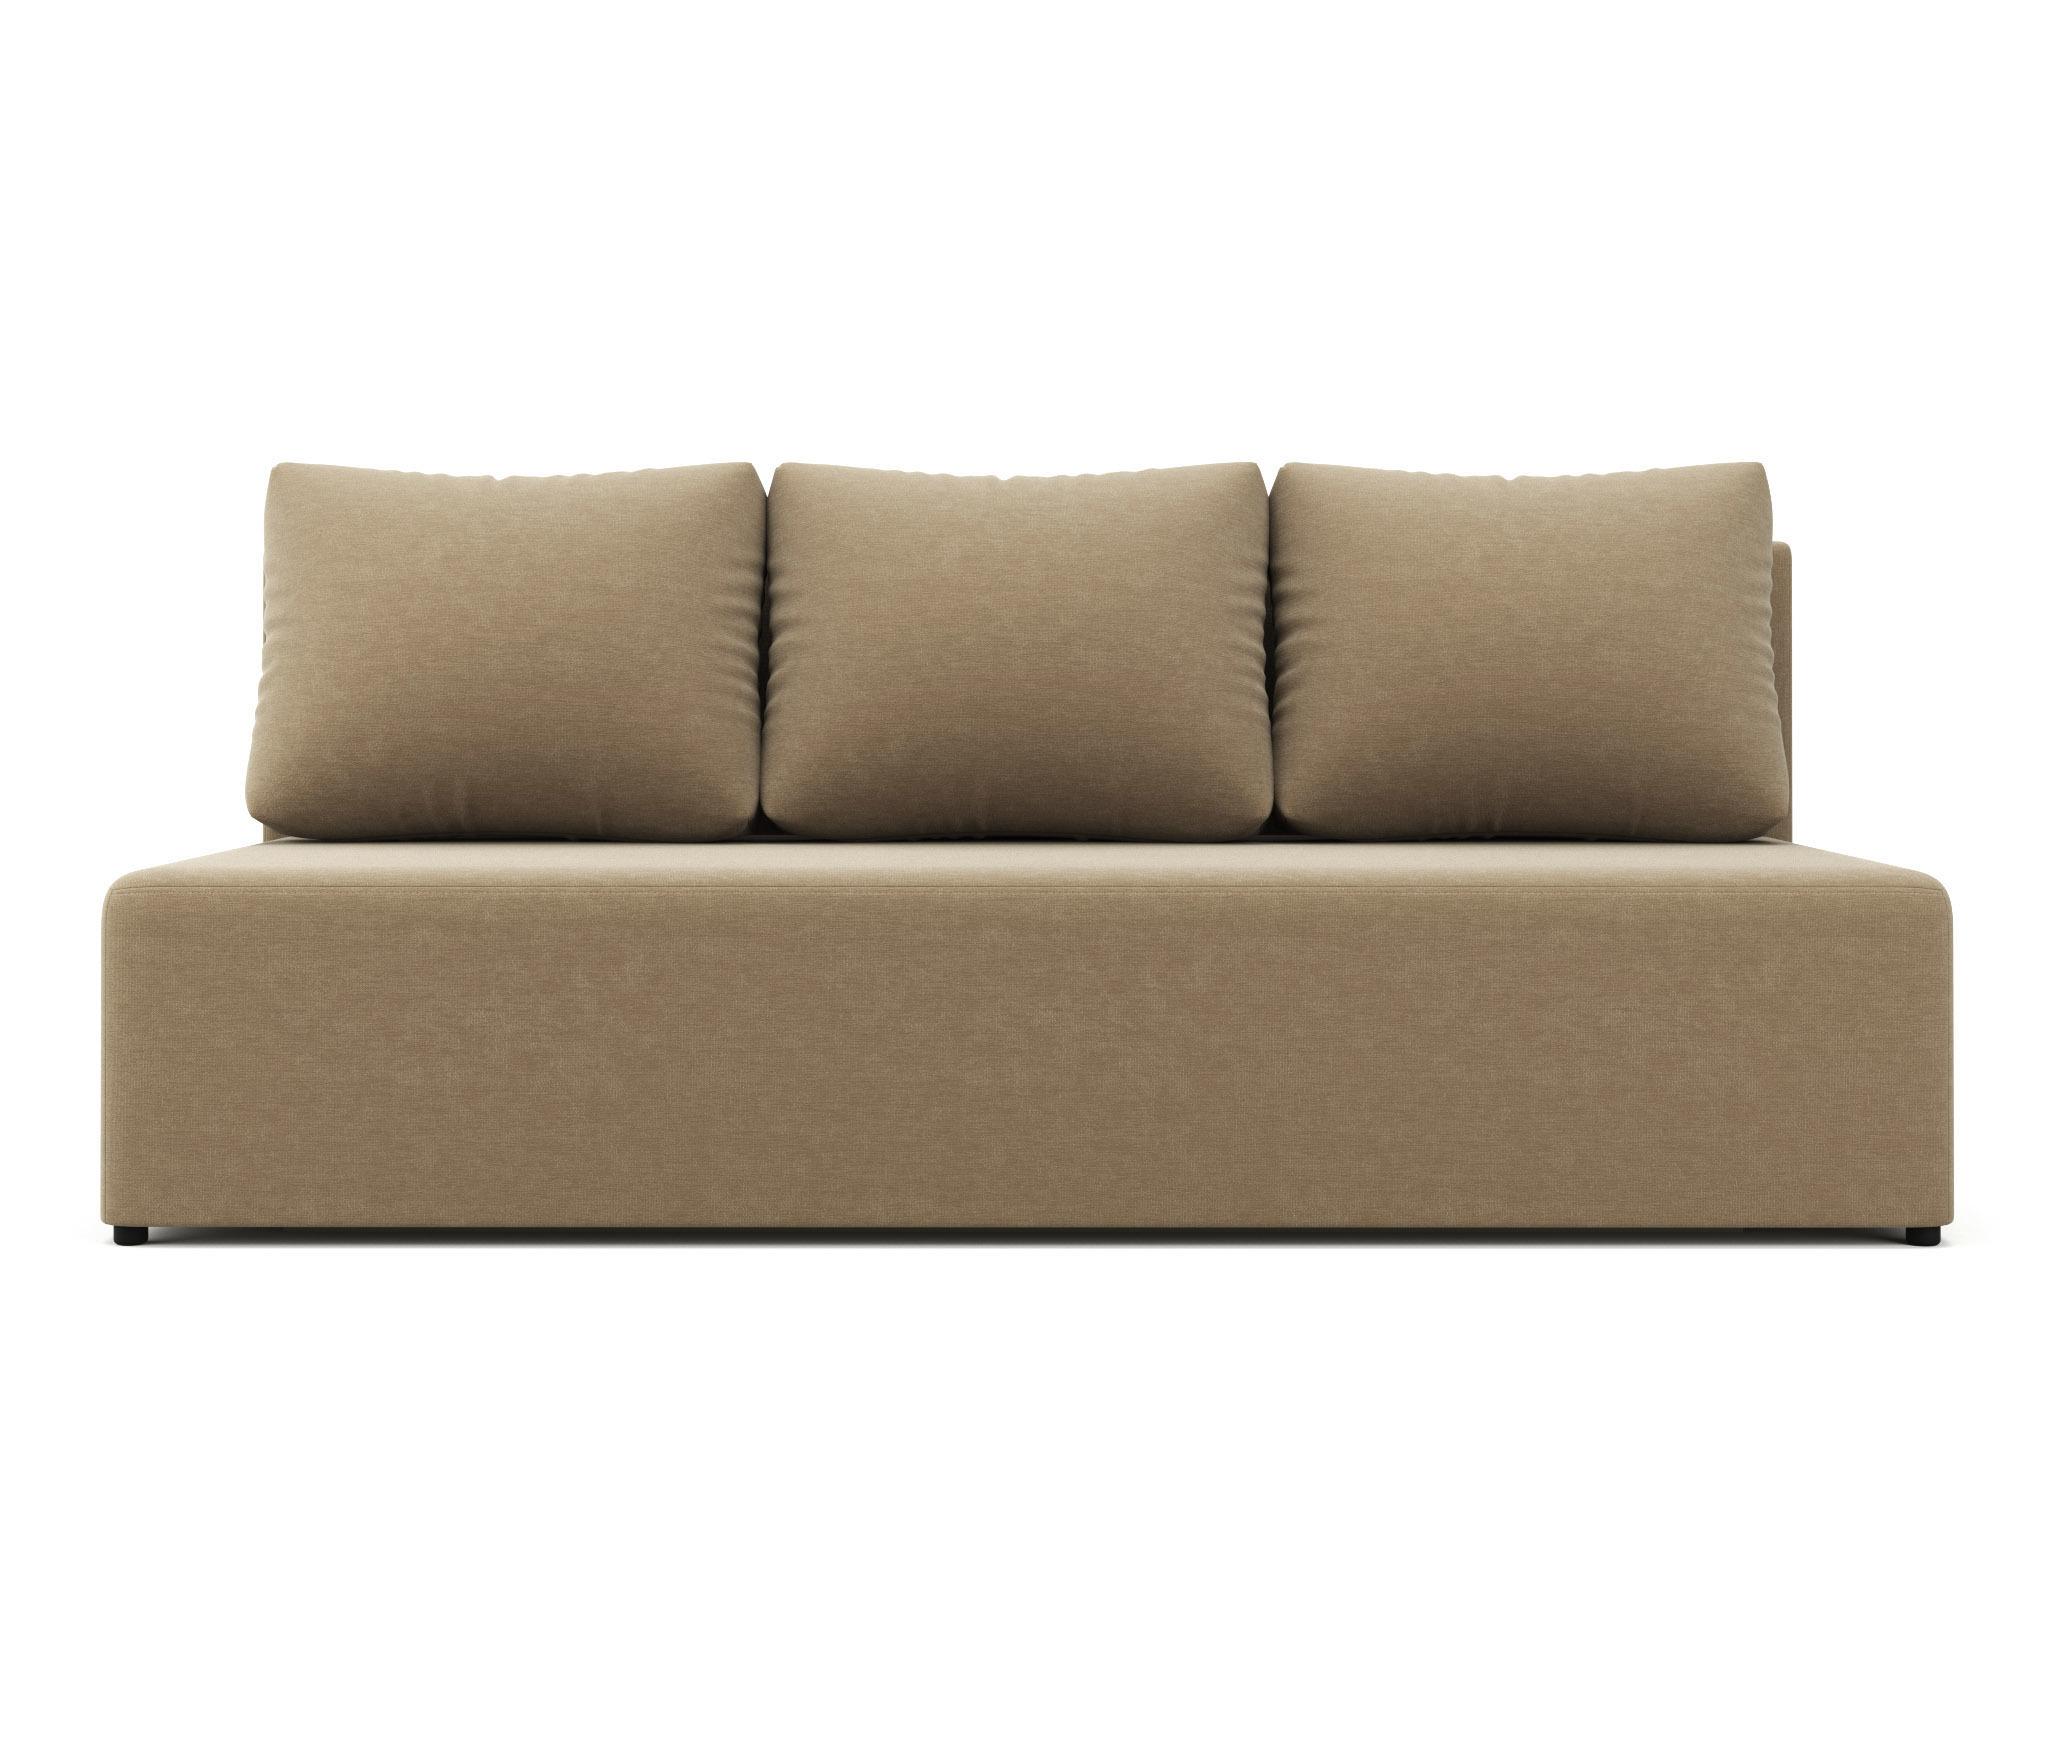 Нексус диван-кровать Faro 102Мягкая мебель<br>Размер (ШхВхГ, см): 185х73х80&#13;Размер спального места (ШхД, см): 130х185&#13;]]&gt;<br><br>Длина мм: 1850<br>Высота мм: 730<br>Глубина мм: 800